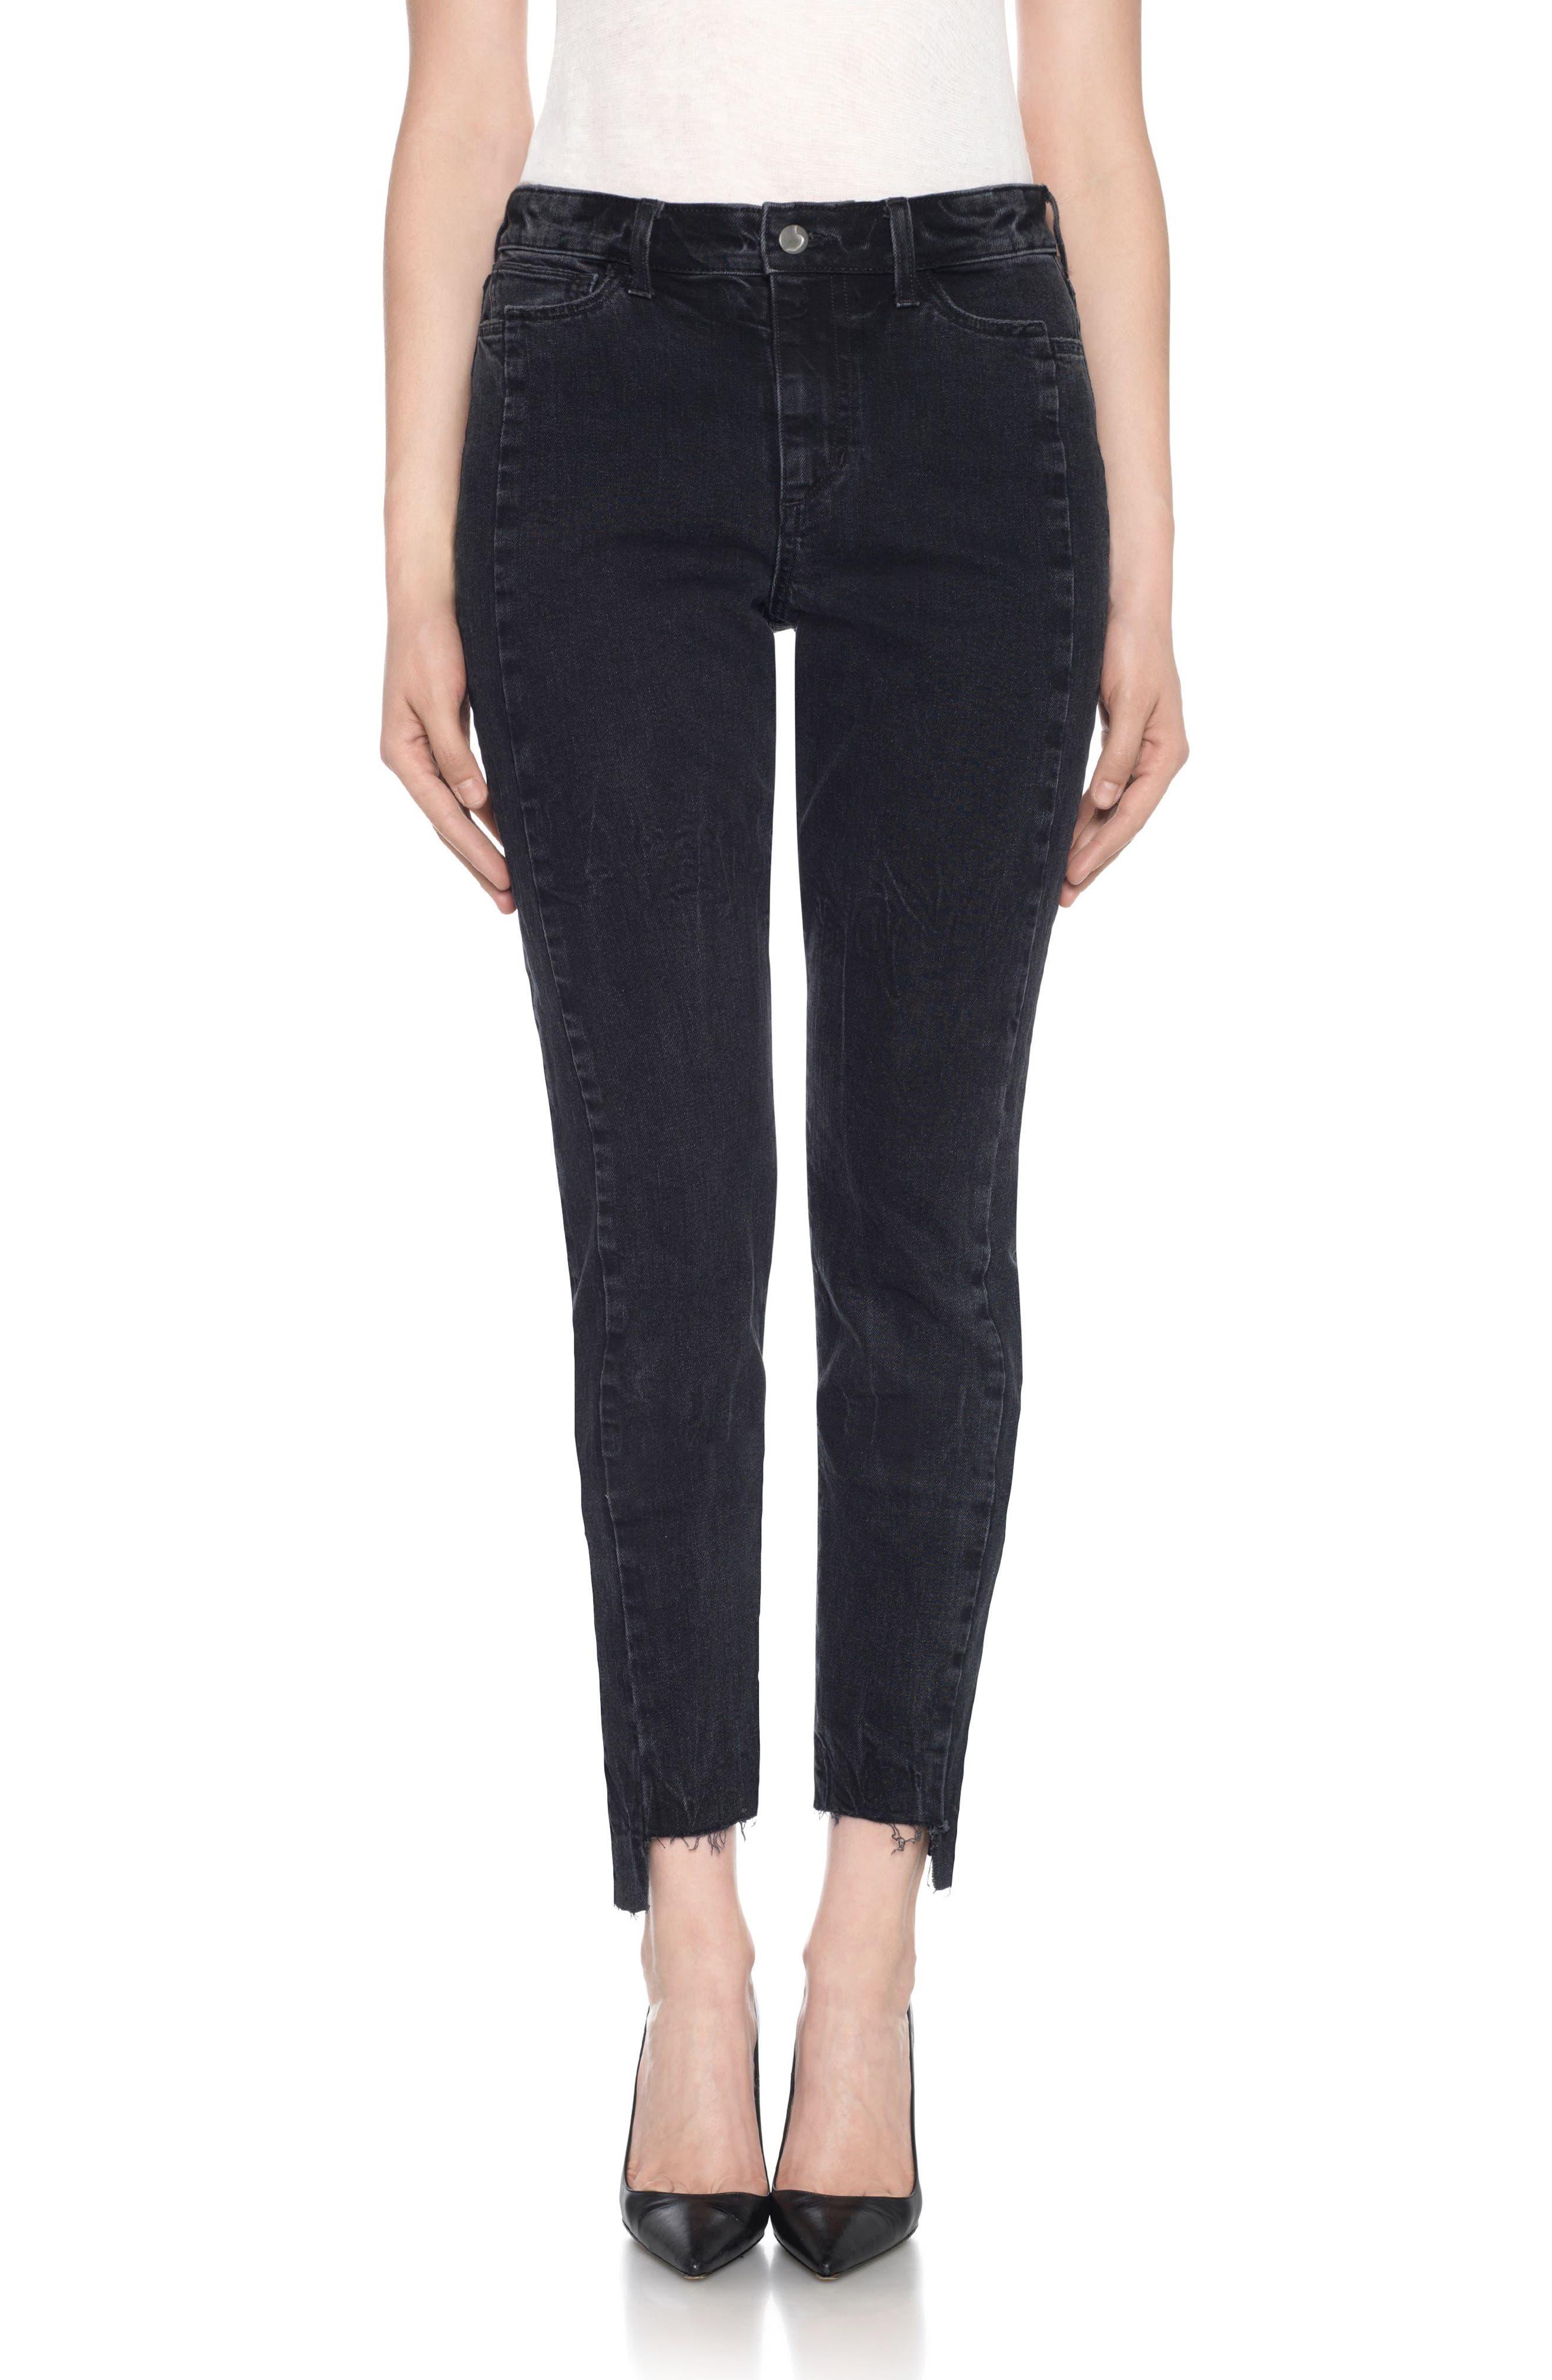 Taylor Hill x Joe's Kass Raw Step Hem Ankle Skinny Jeans,                             Main thumbnail 1, color,                             Domino